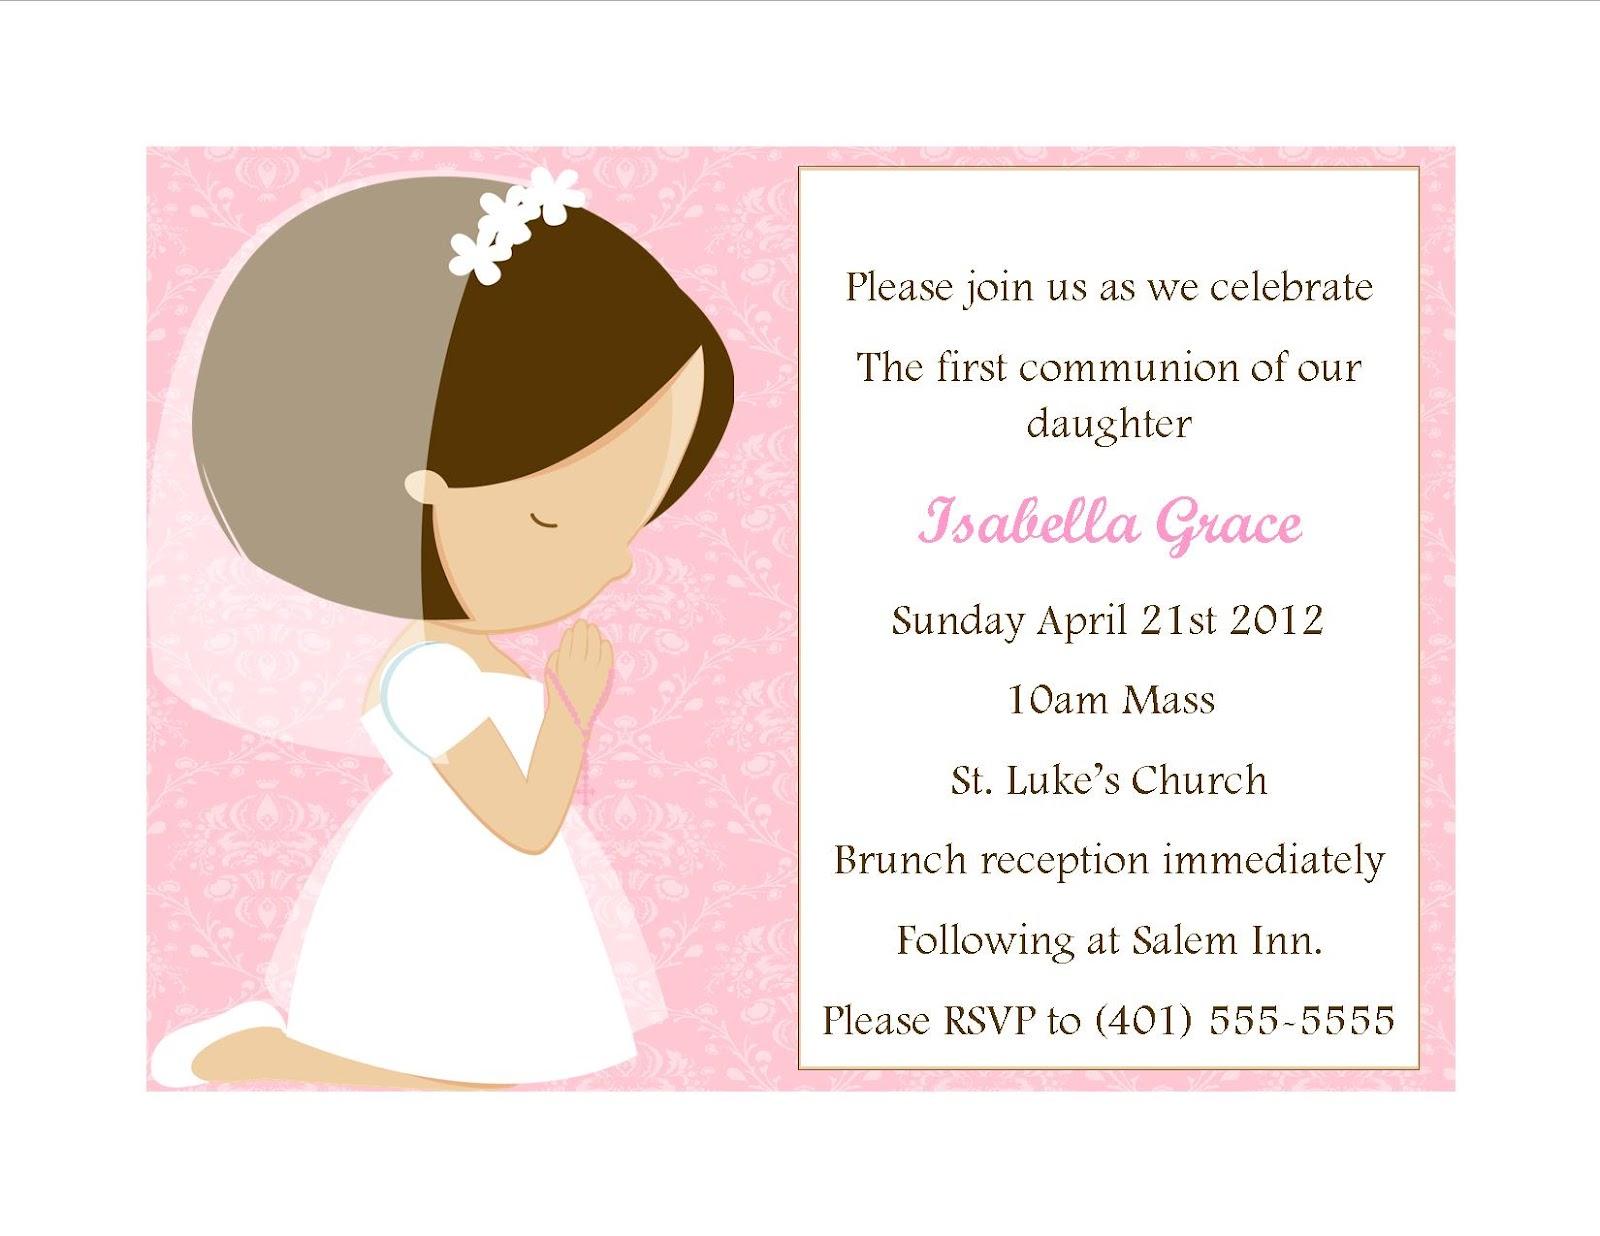 First Communion Invitations - Wedding Plan Ideas